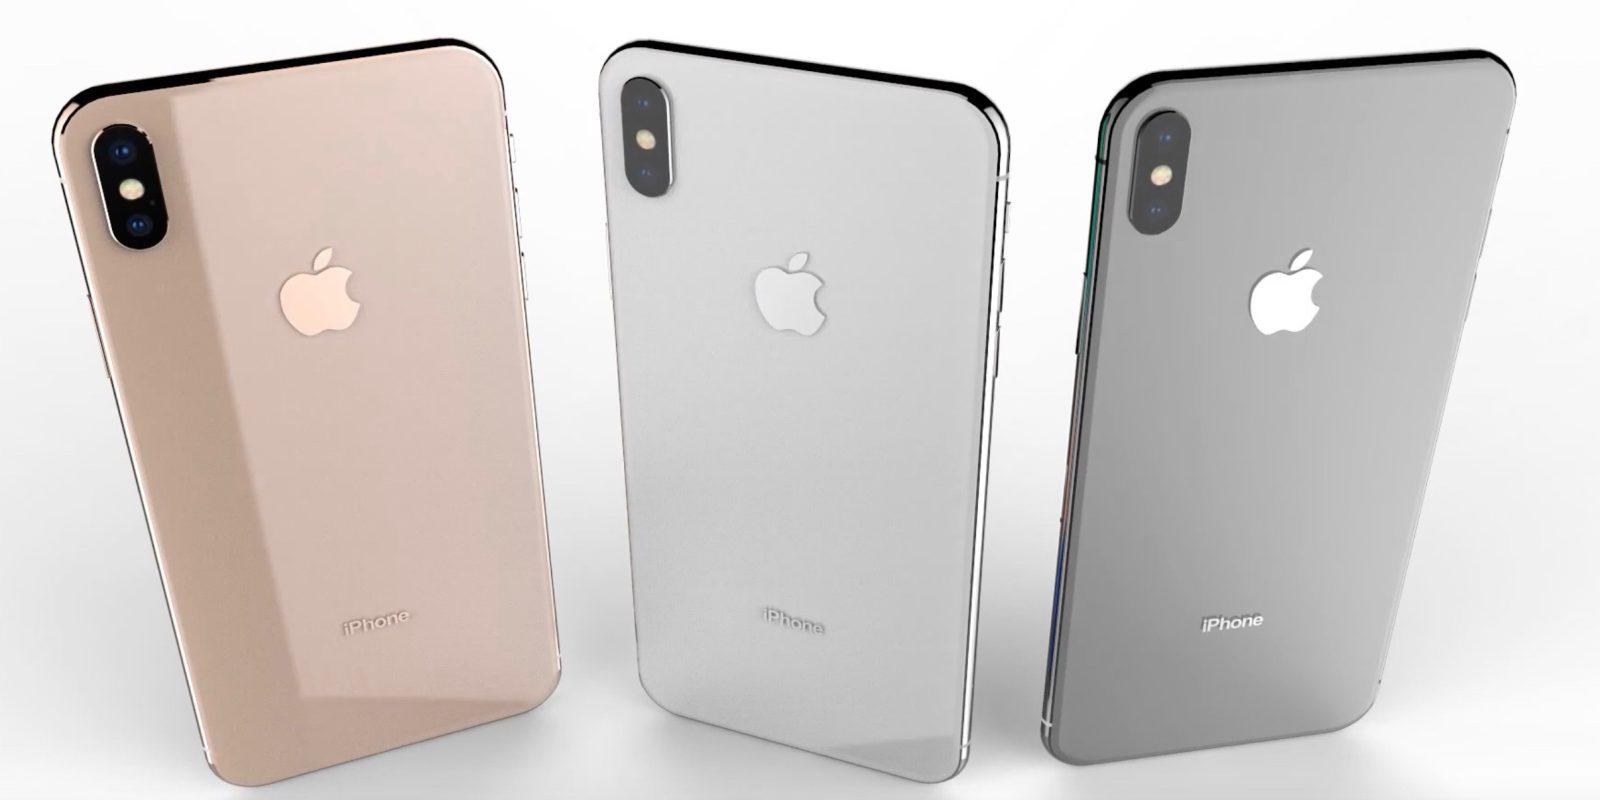 Cand apare iPhone X Plus » pret posibil in Romania si imagini noi